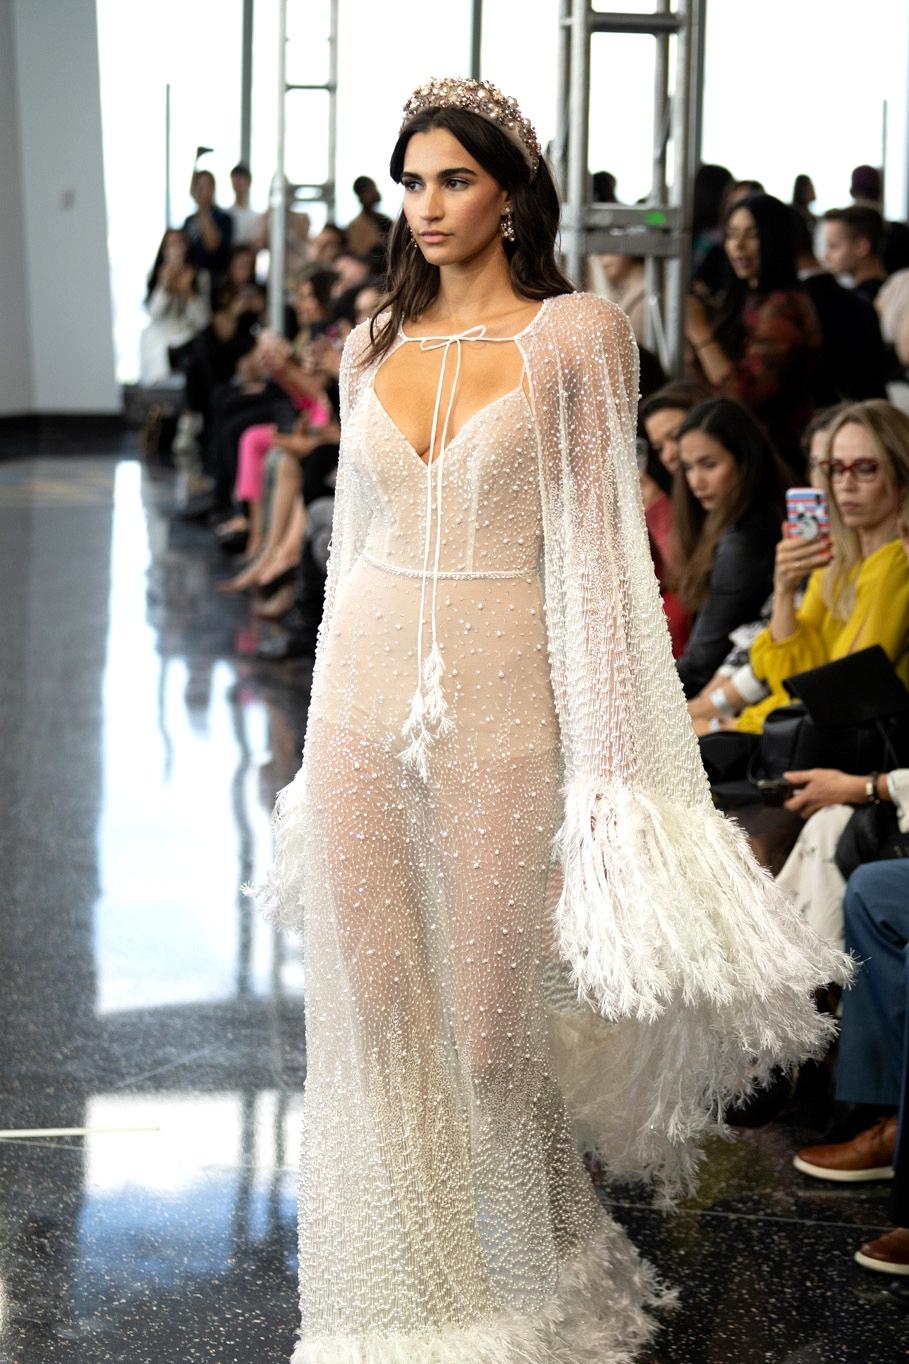 Berta Wedding Dress with Fringe and Cape